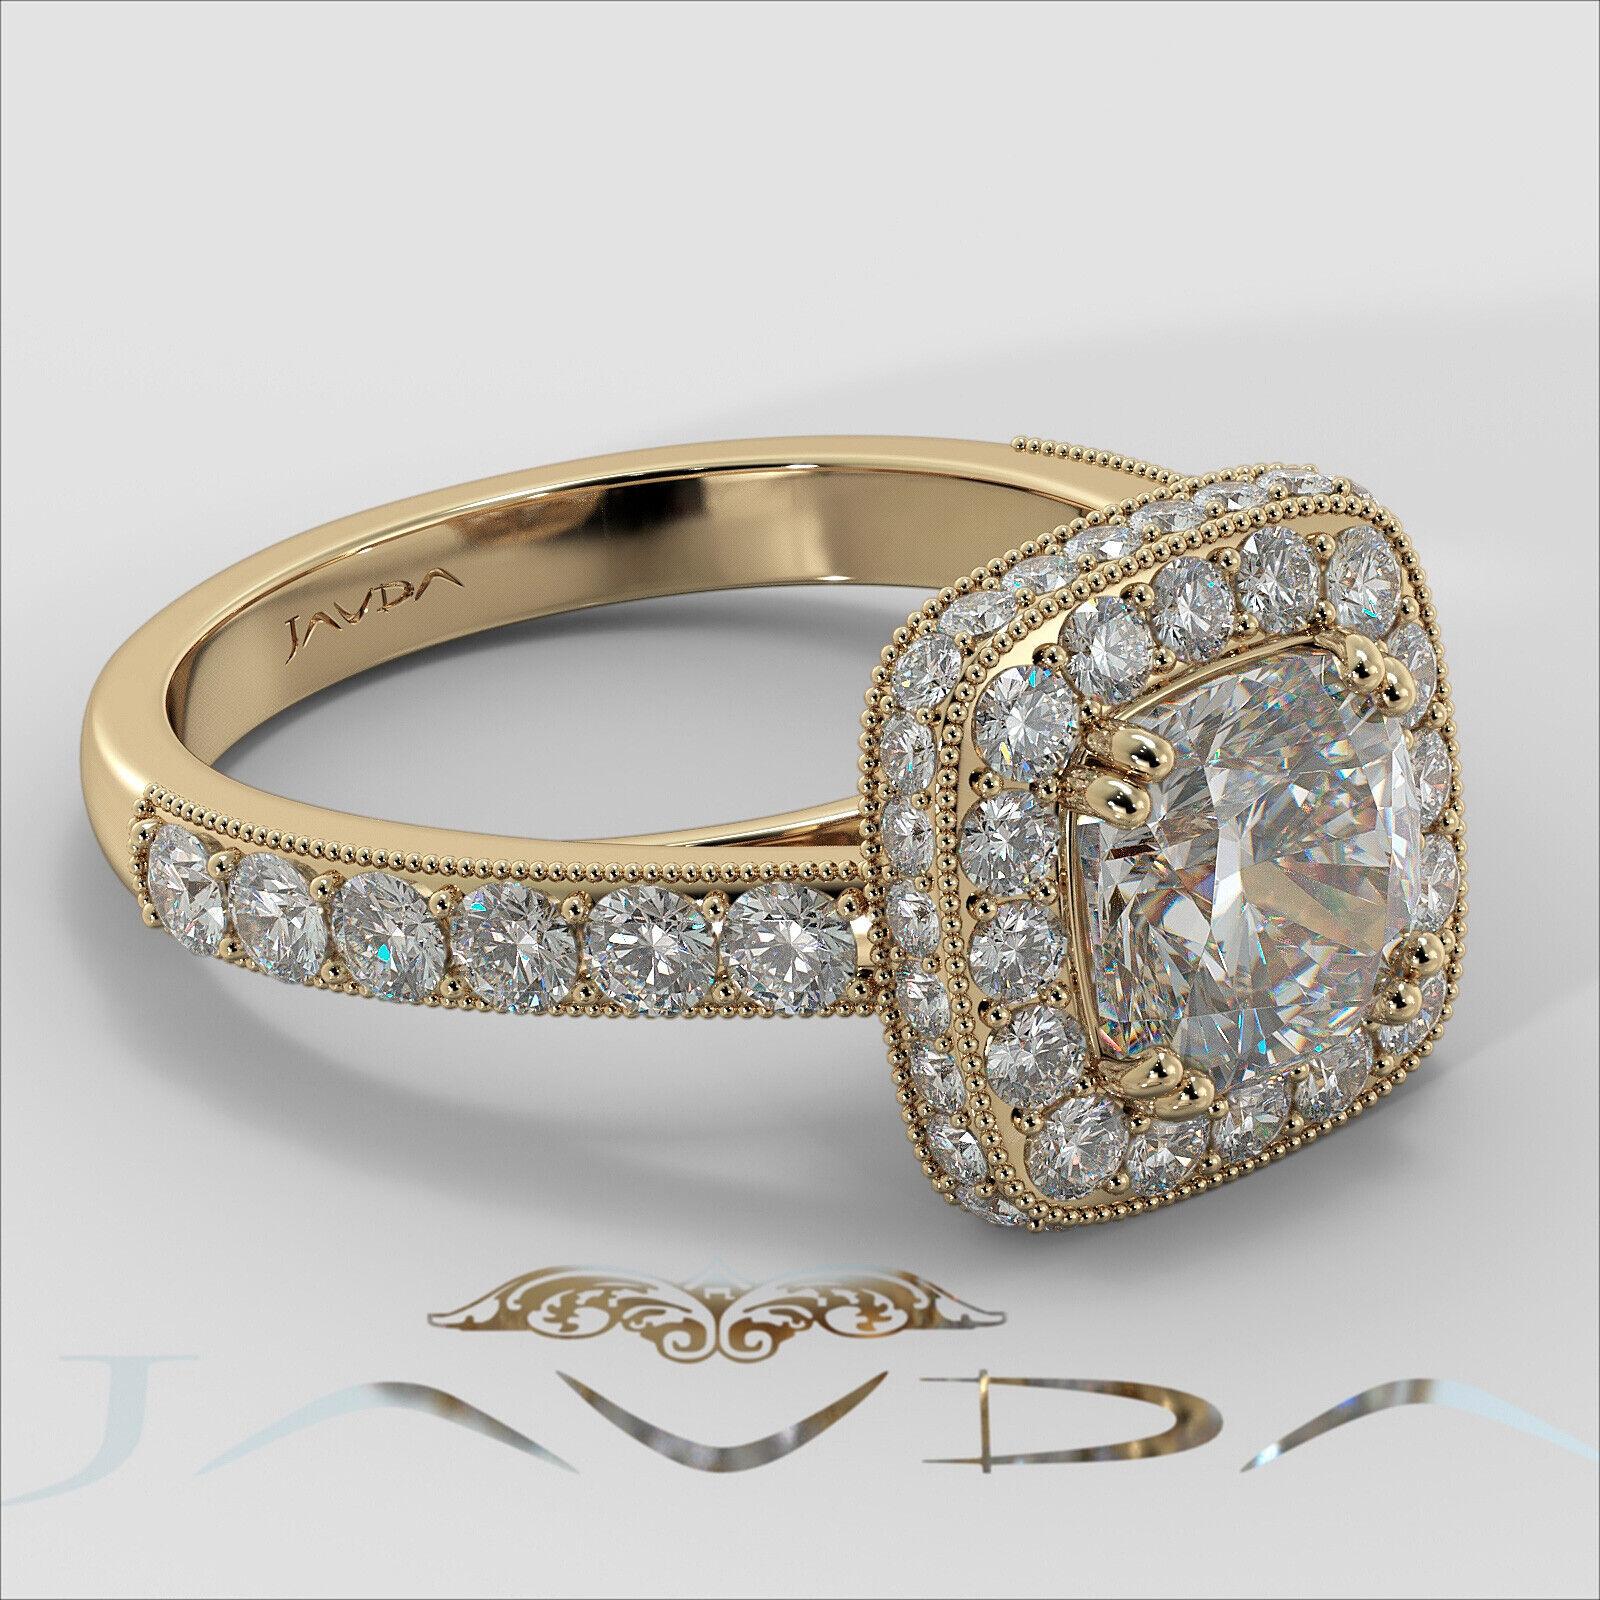 2.12ctw Milgrain Floral Basket Cushion Diamond Engagement Ring GIA I-SI2 W Gold 9